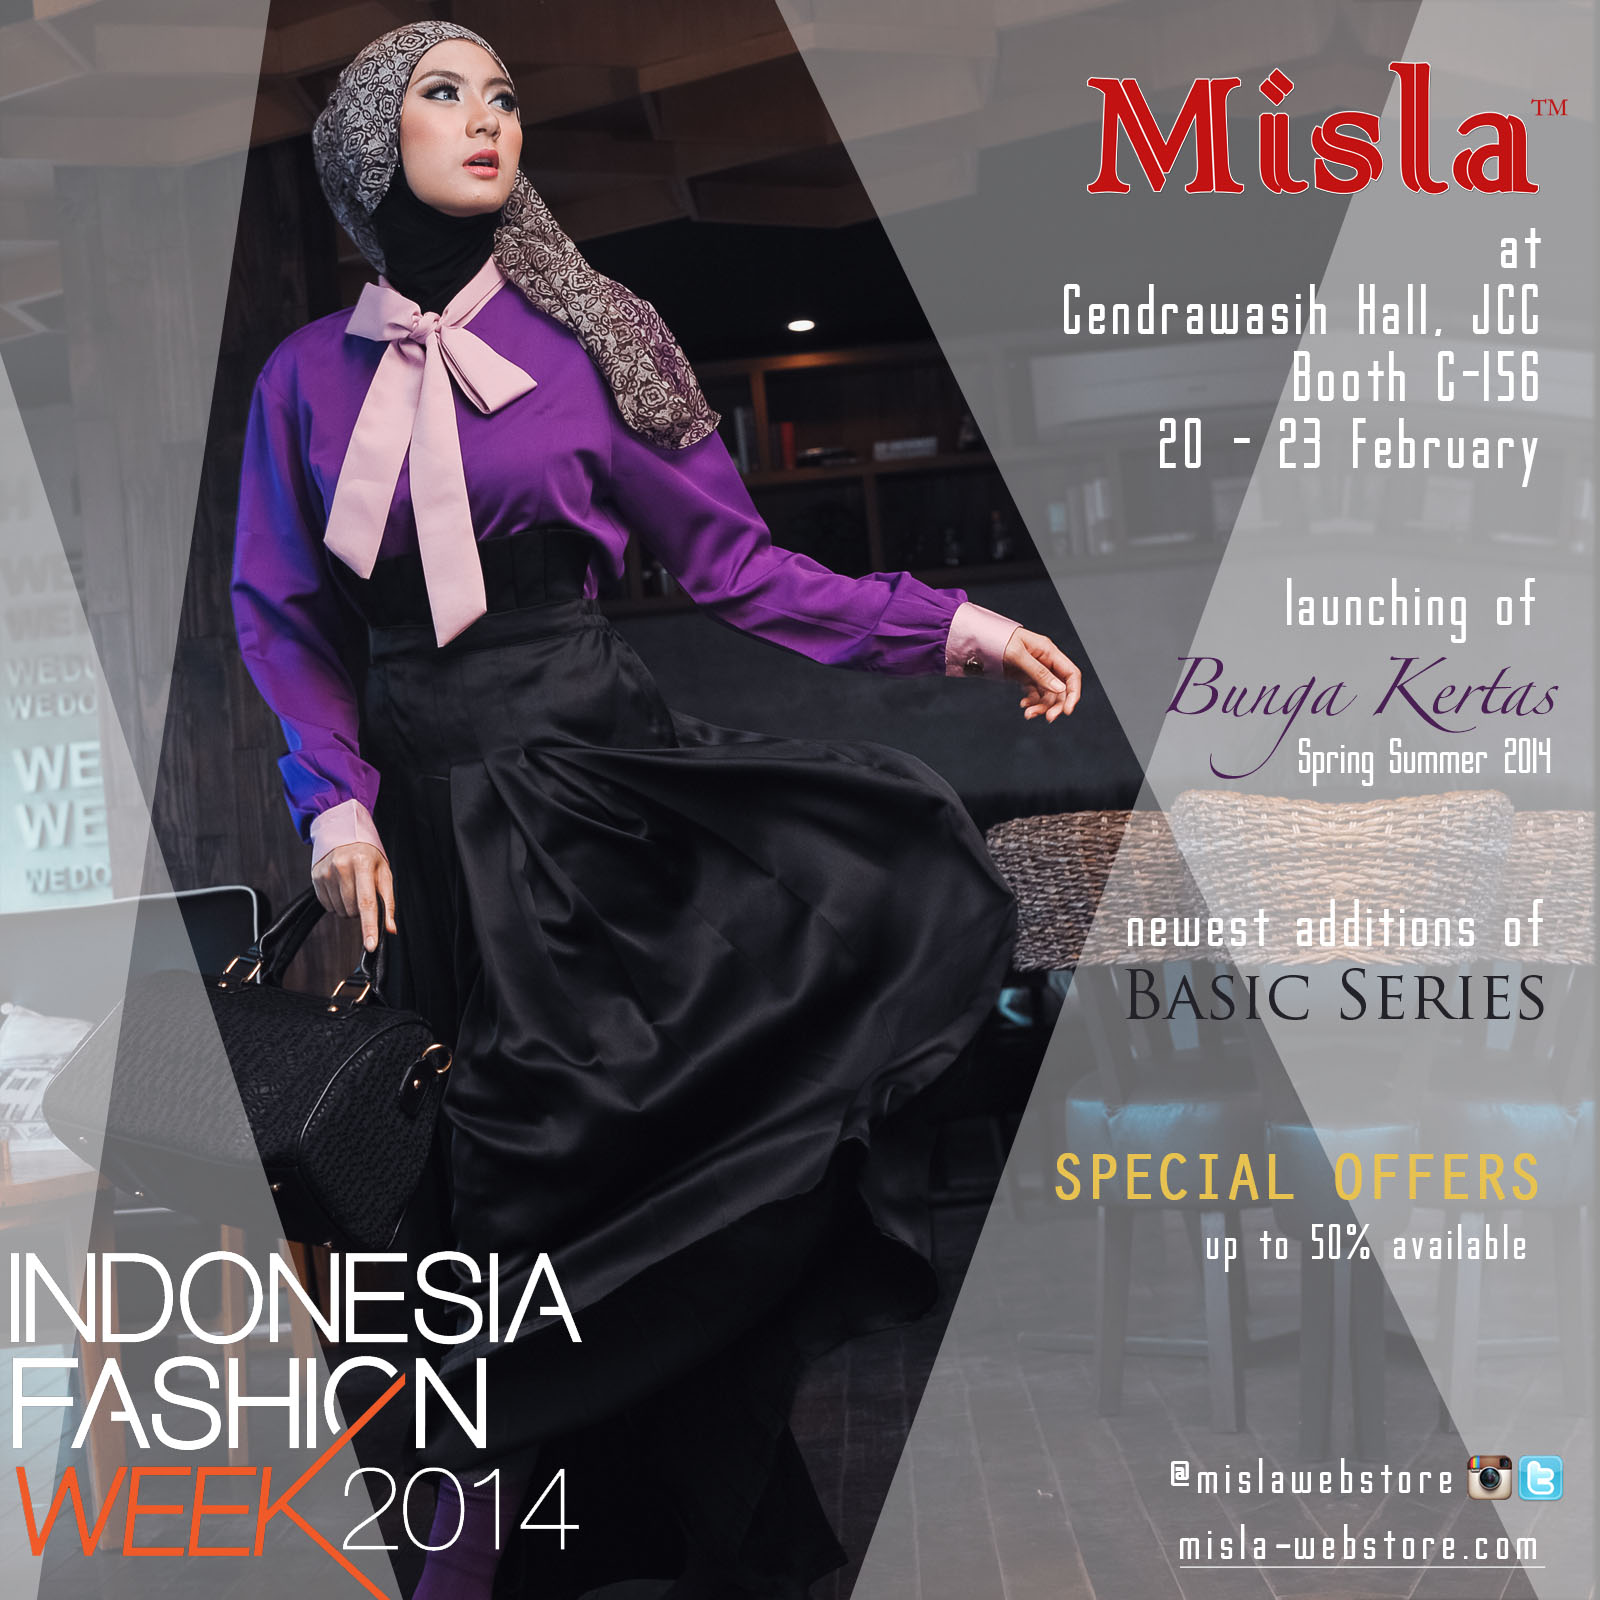 banner-ig MISLA at Indonesia Fashion Week 2014